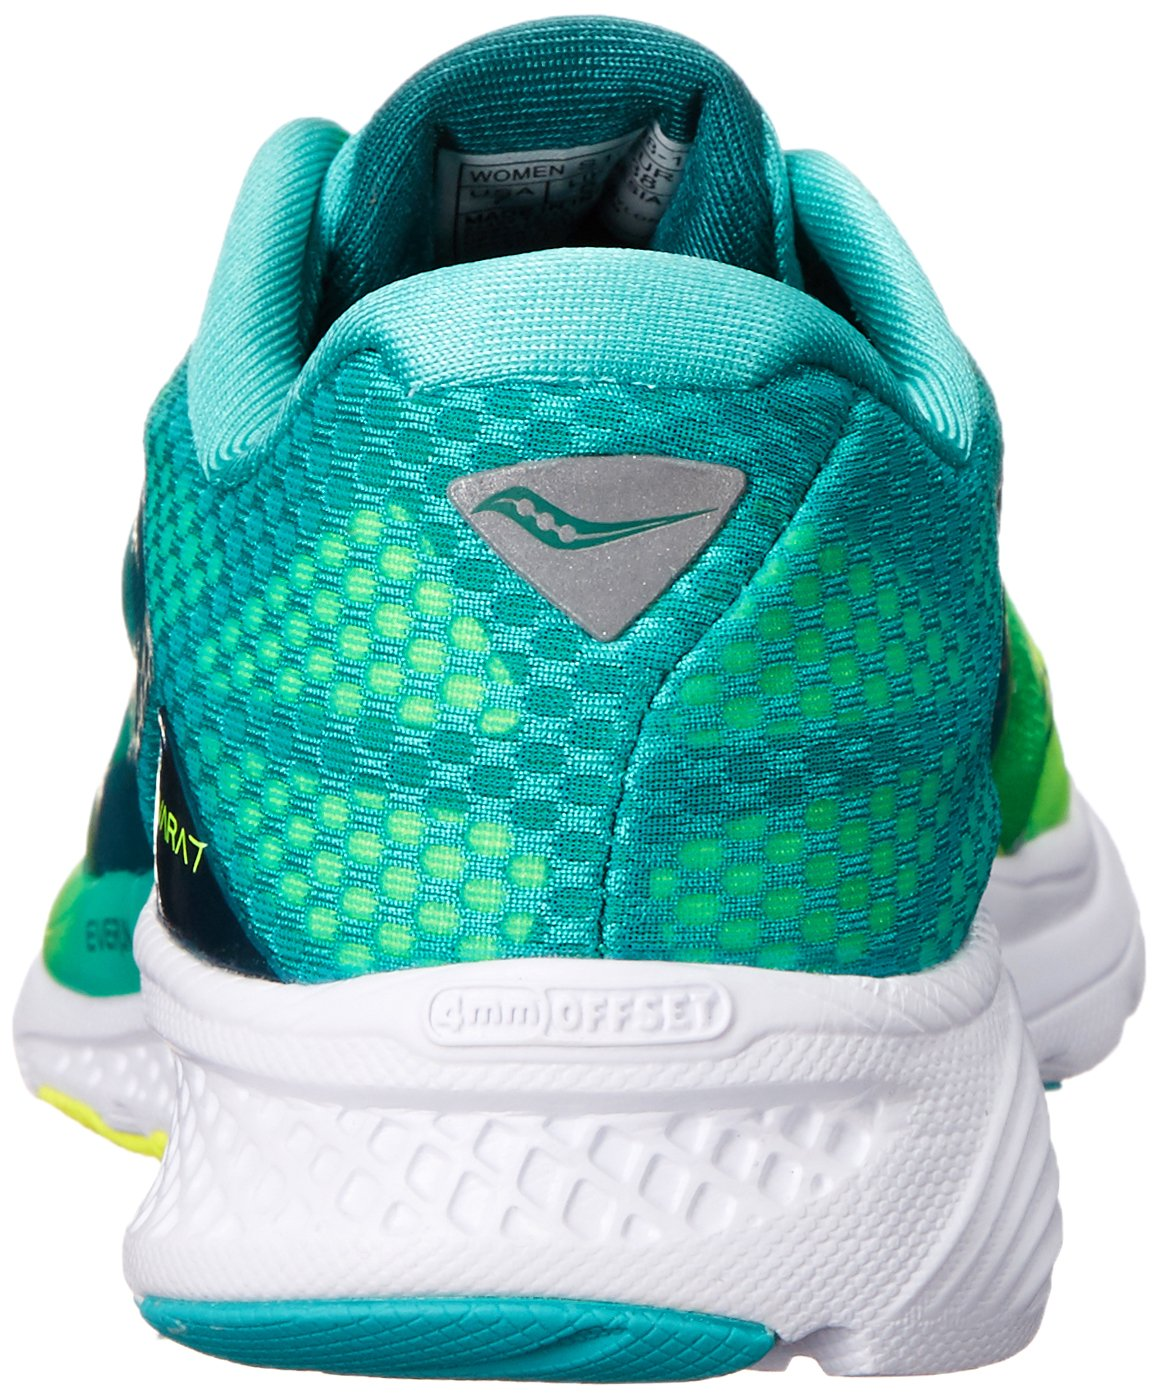 Saucony Women's B00YBFI41W Kinvara 7 Running Shoe B00YBFI41W Women's 5 B(M) US|Teal/Citron 15b05c